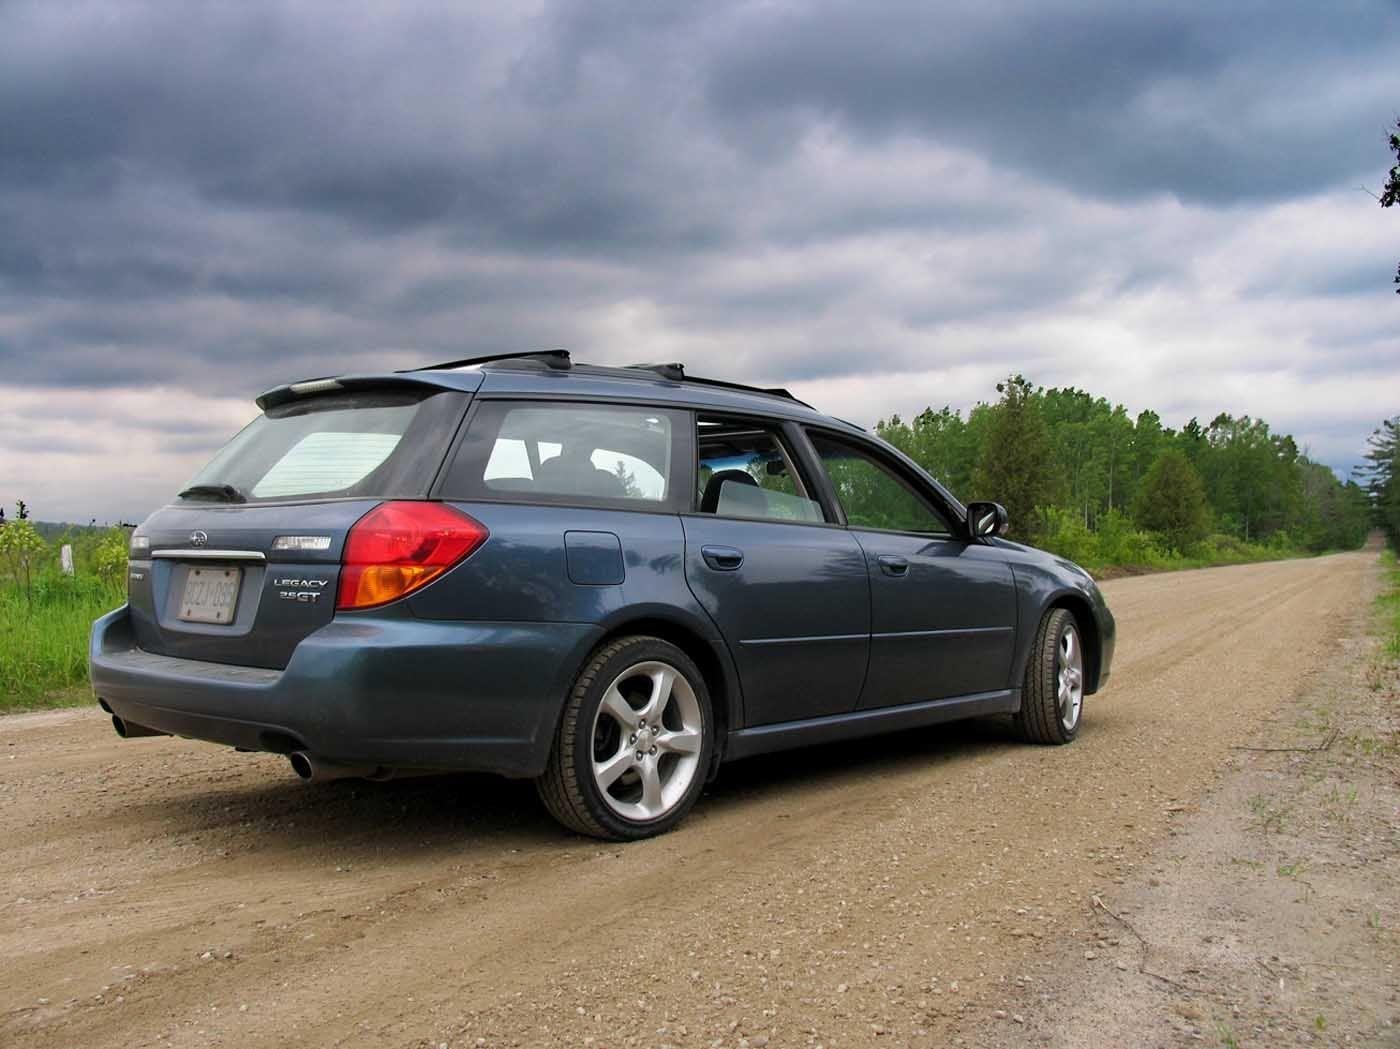 Subaru legacy gt wagon subaru pinterest subaru legacy gt subaru legacy gt wagon vanachro Images